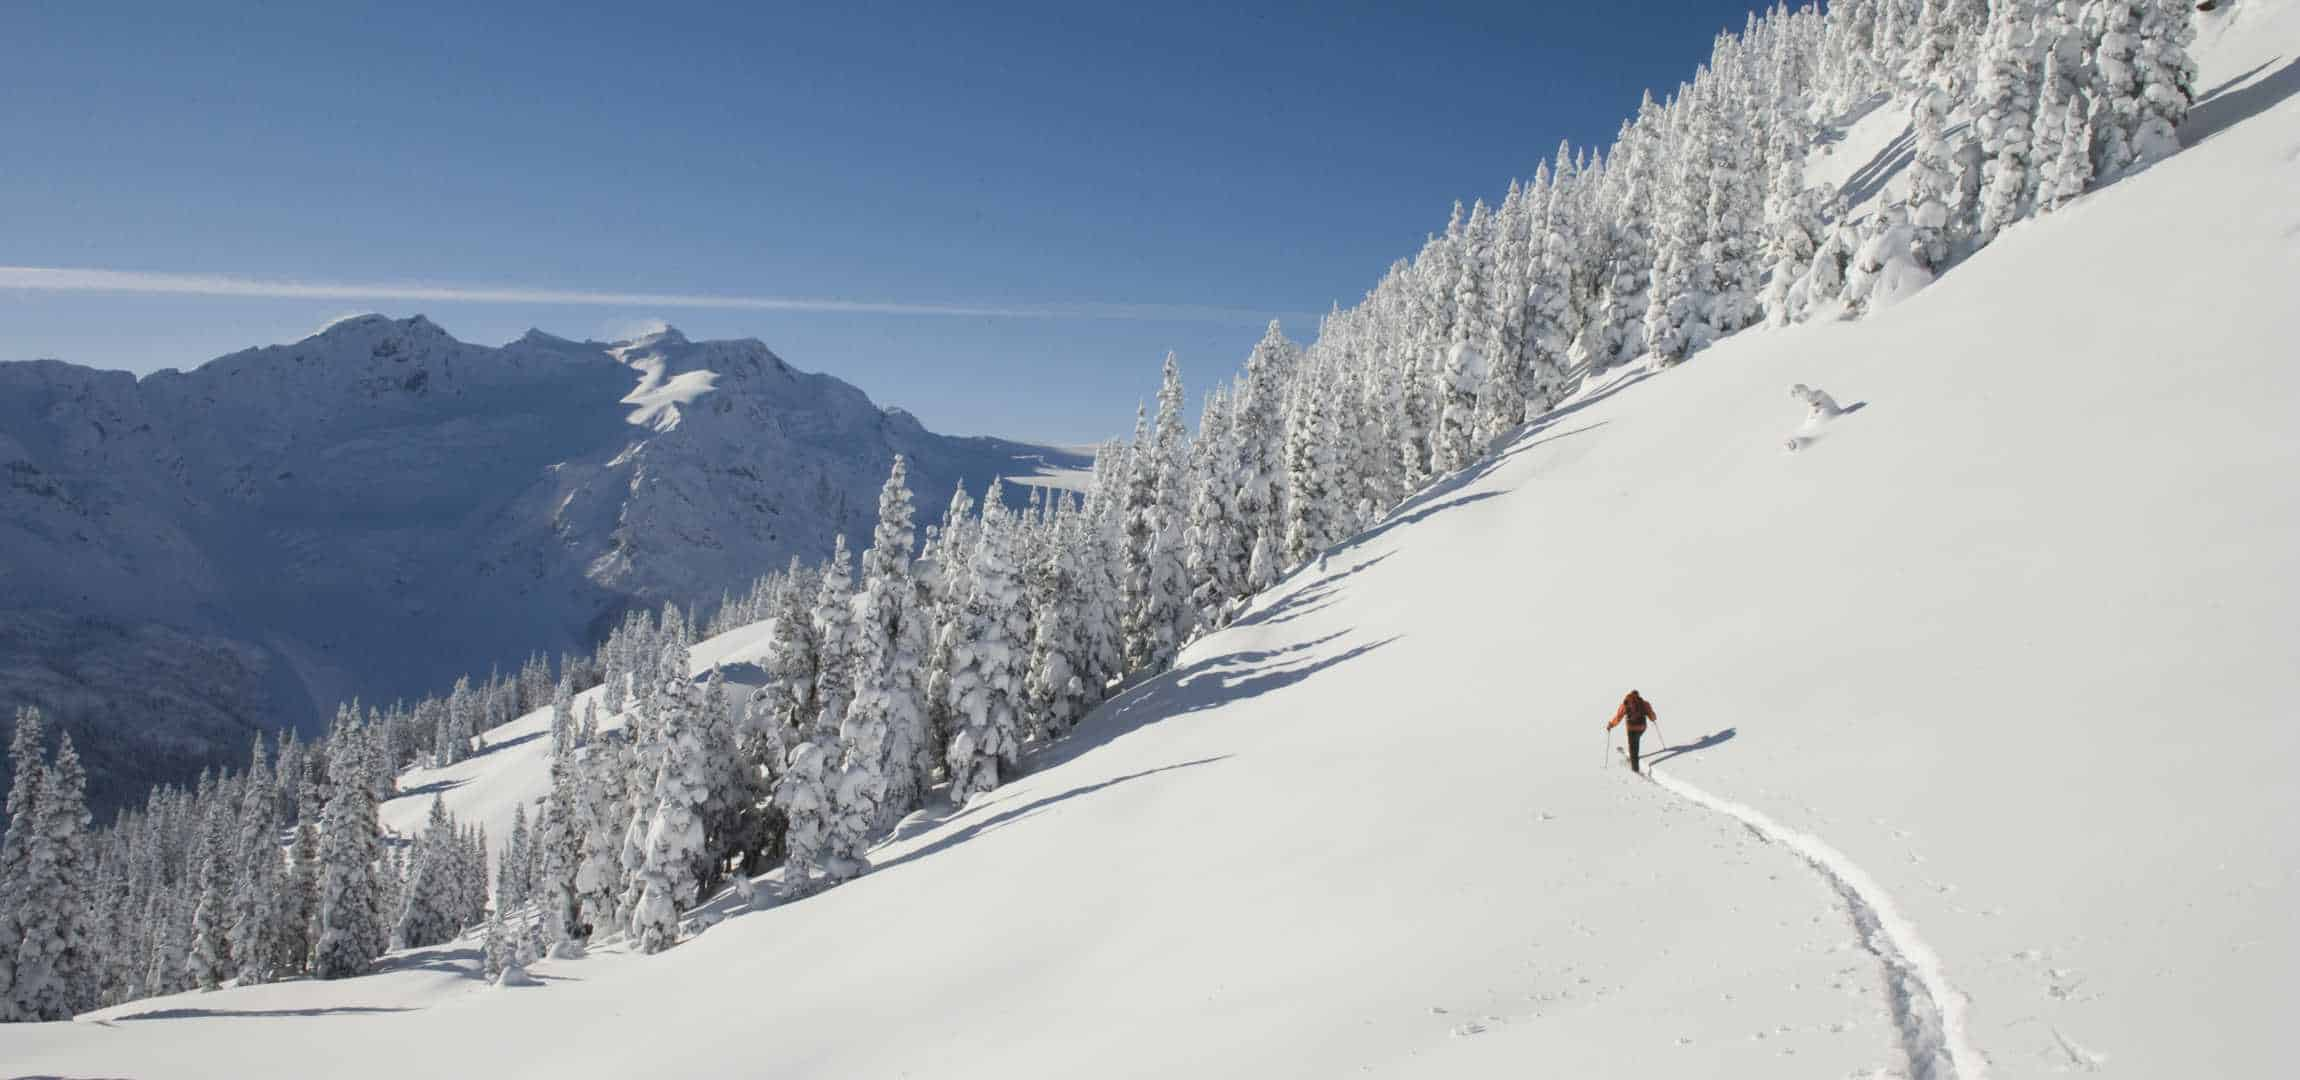 Pemberton Backcountry Skiing